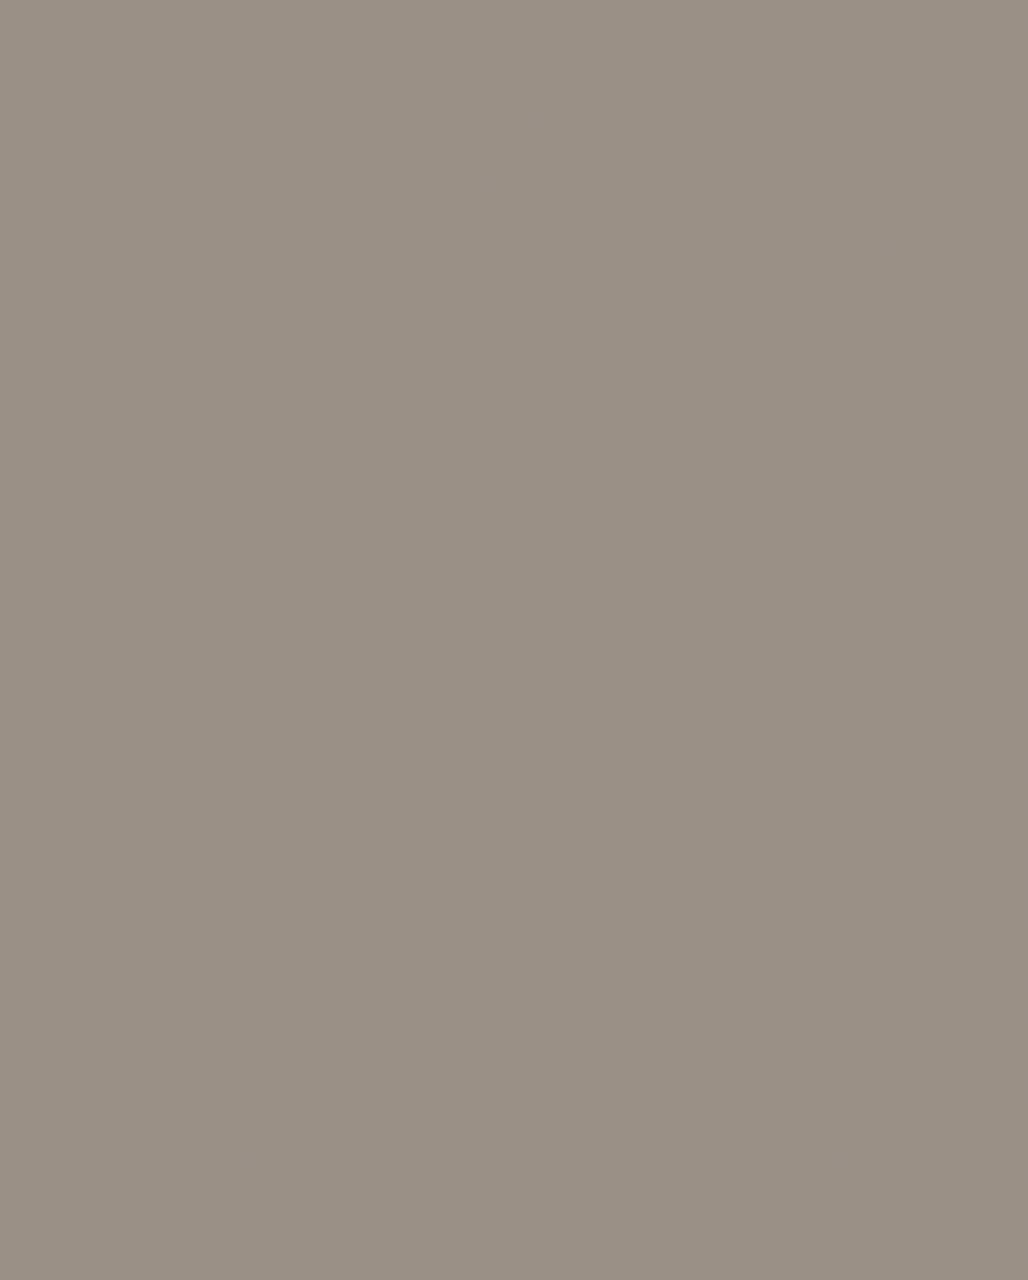 K096 Clay Grey (MF PB sample)